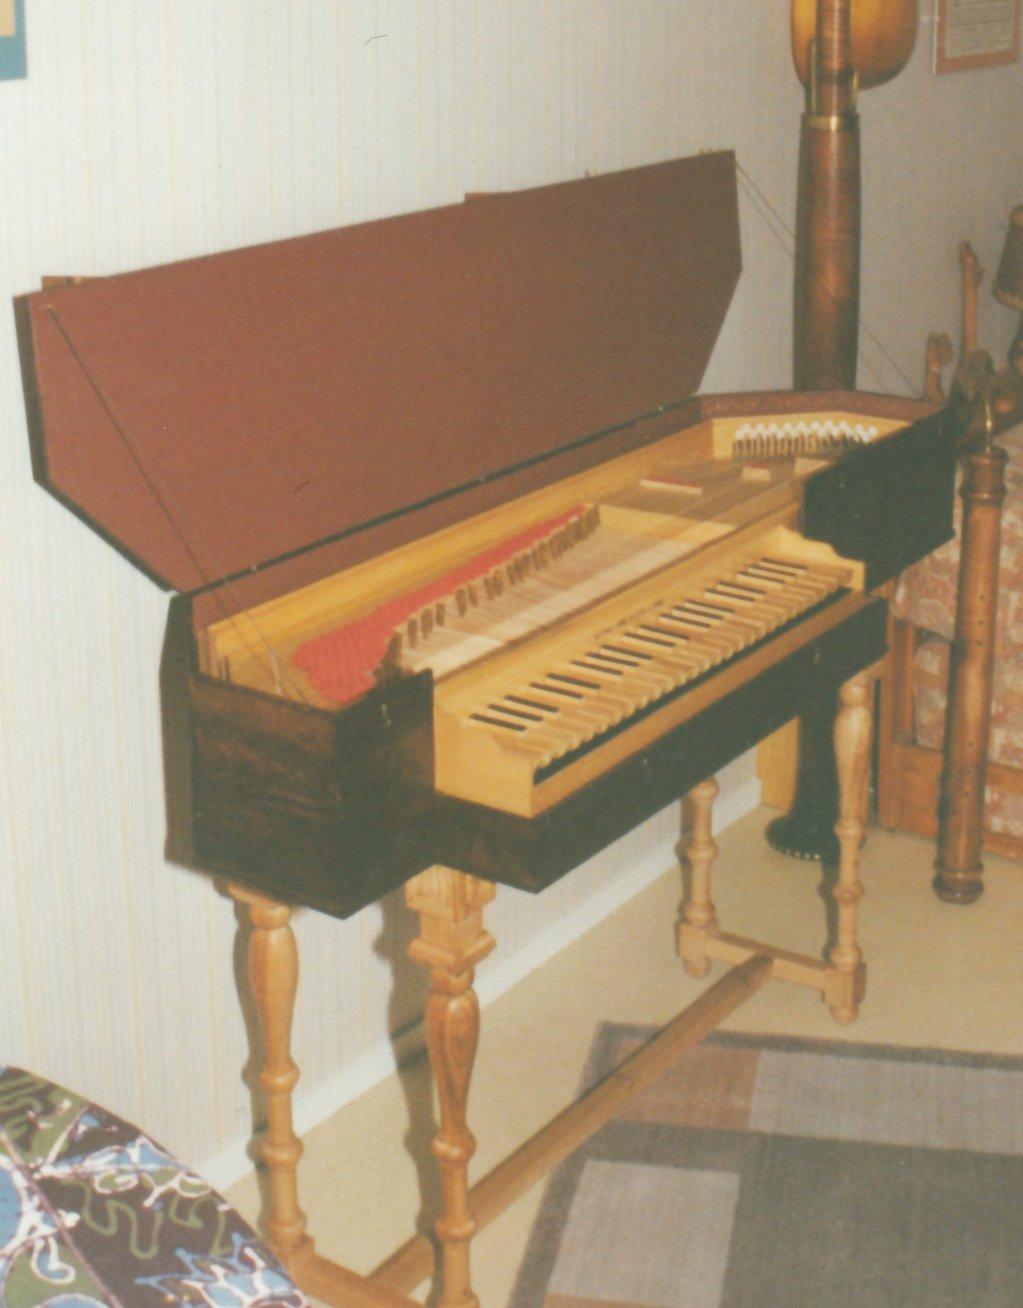 Fabrication d'instruments de musique anciens de bgire BJQ3Ib-1992-Clavicorde-Pisaurensis-52